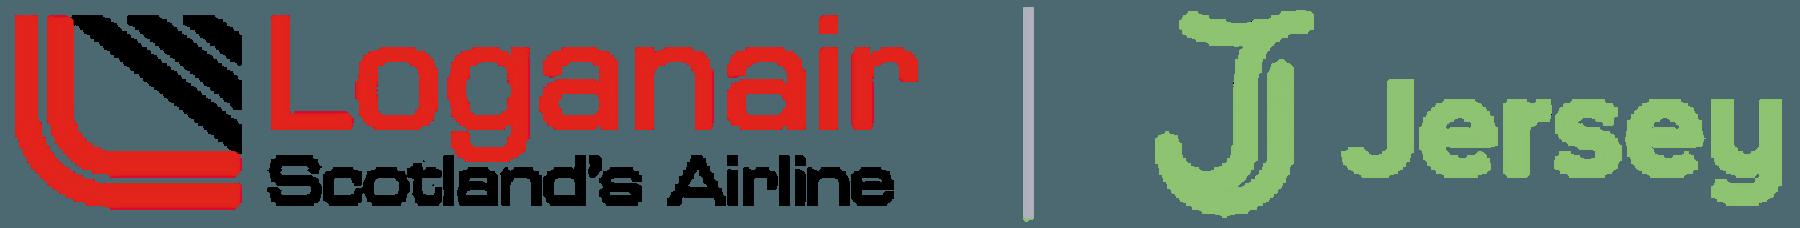 Loganair and Visit Jersey logos